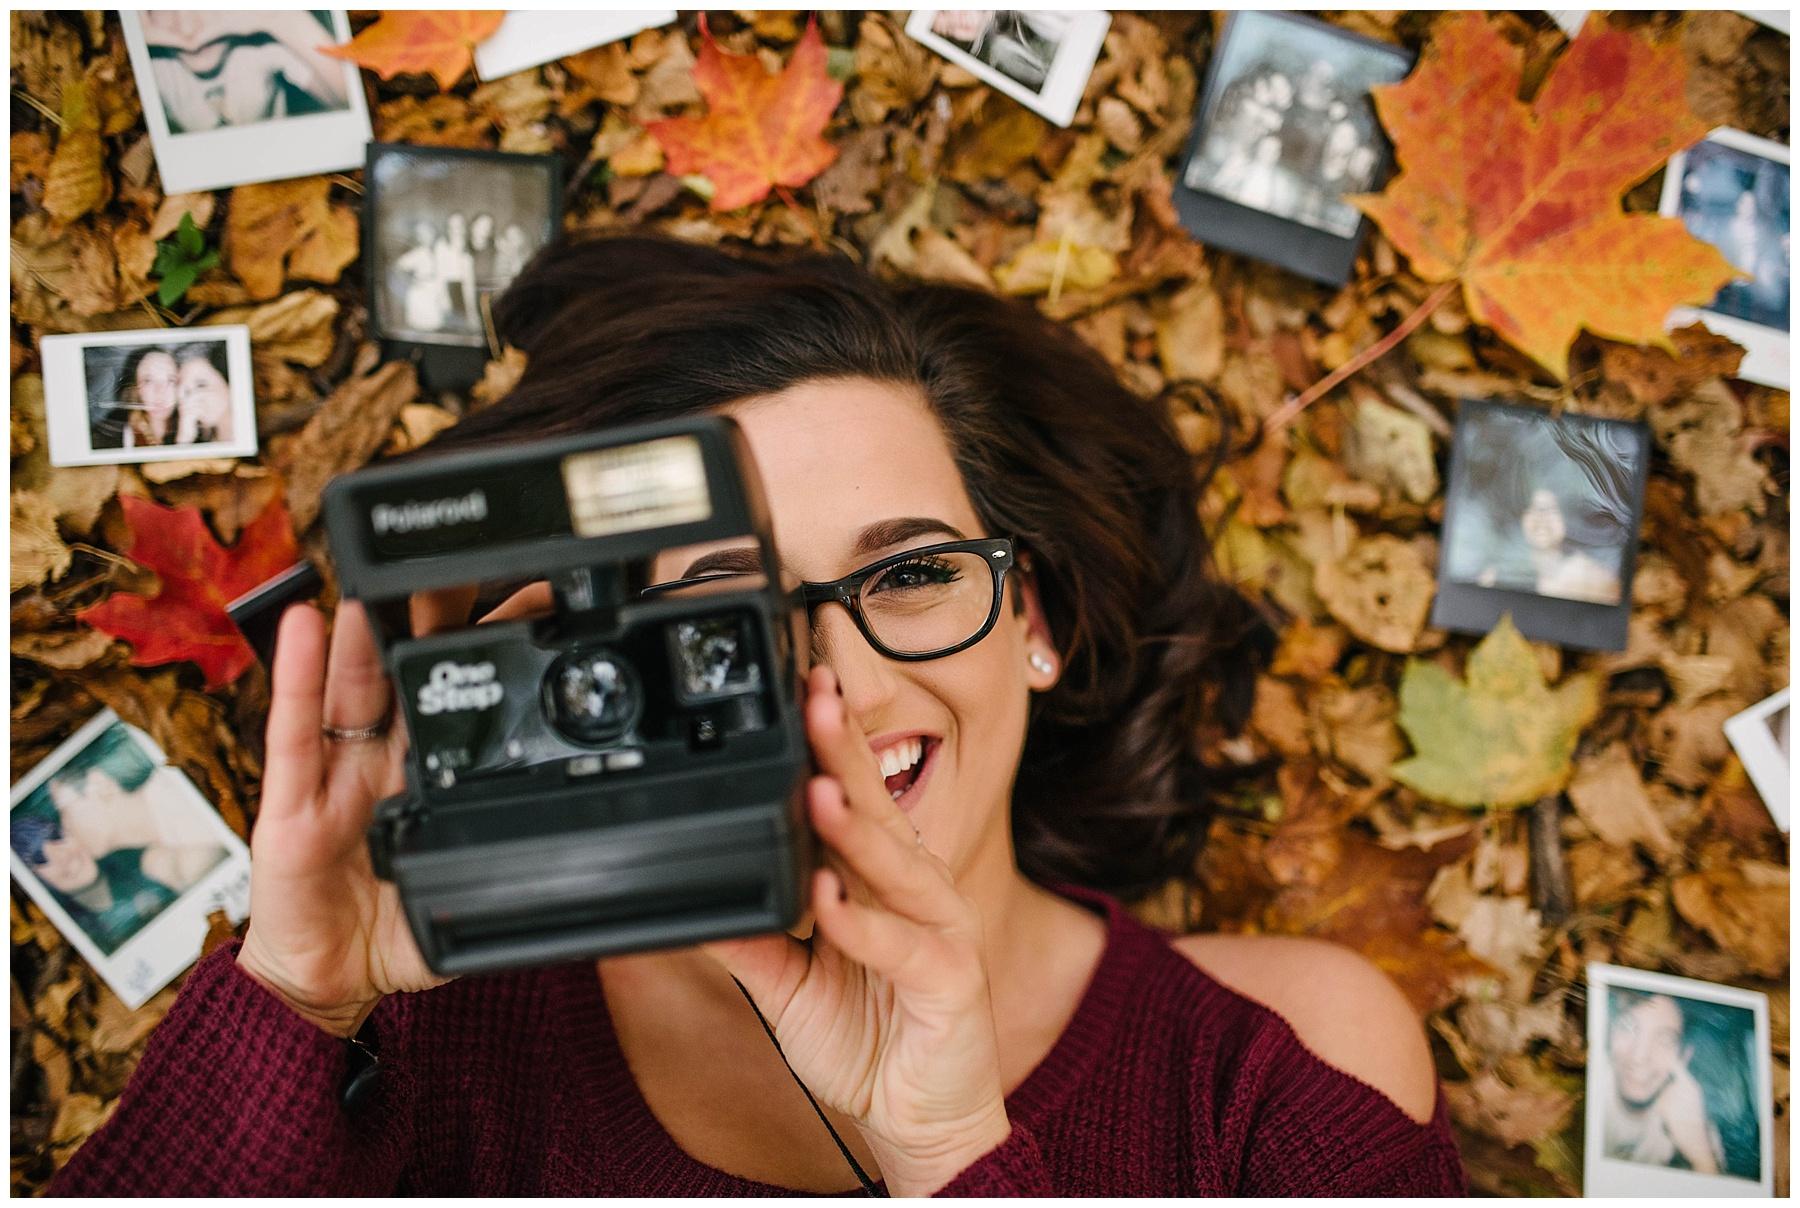 senior with polaroid camera